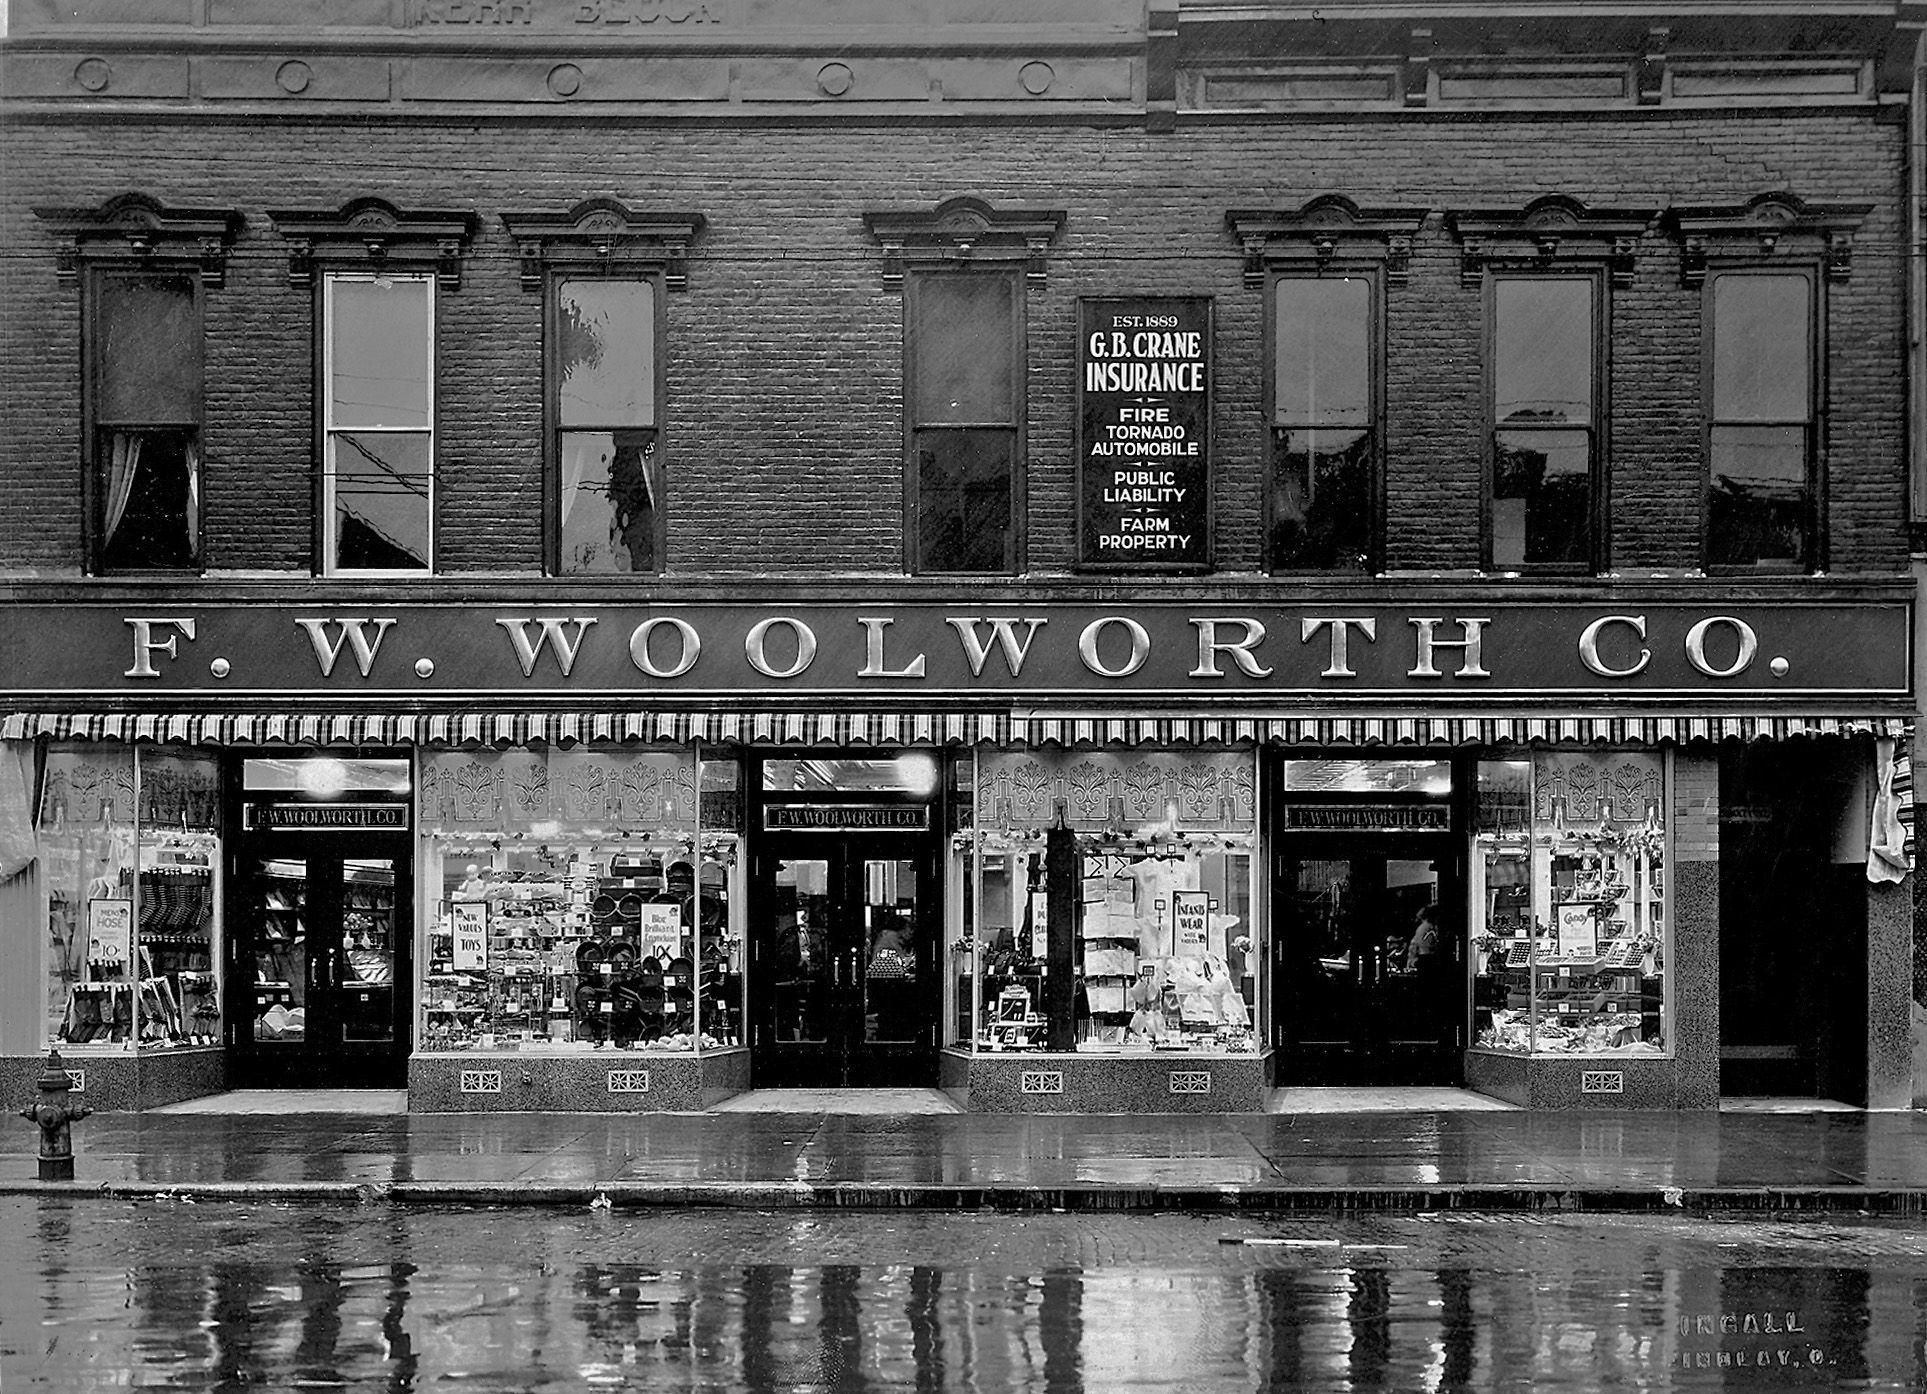 Findlay Ohio, Woolworth's Shorpy historical photos